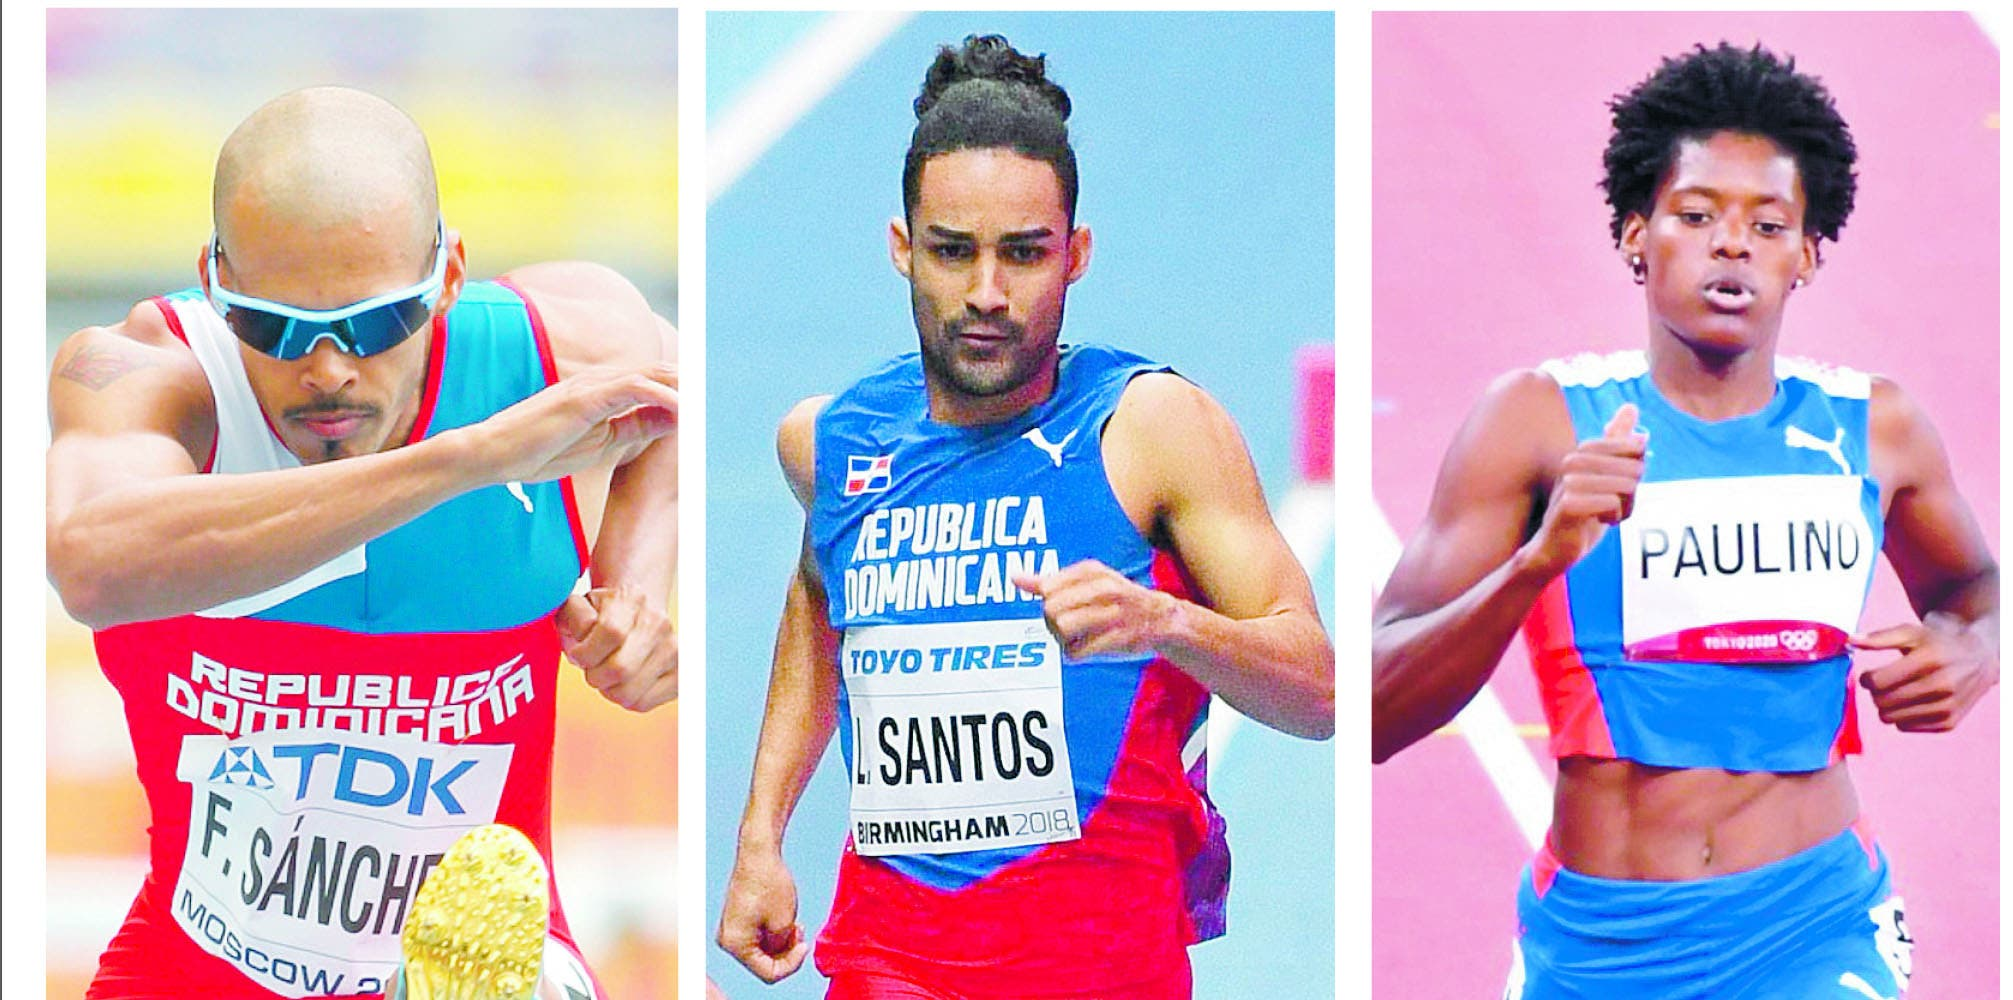 Atletismo marca ritmo deportes olímpicos RD